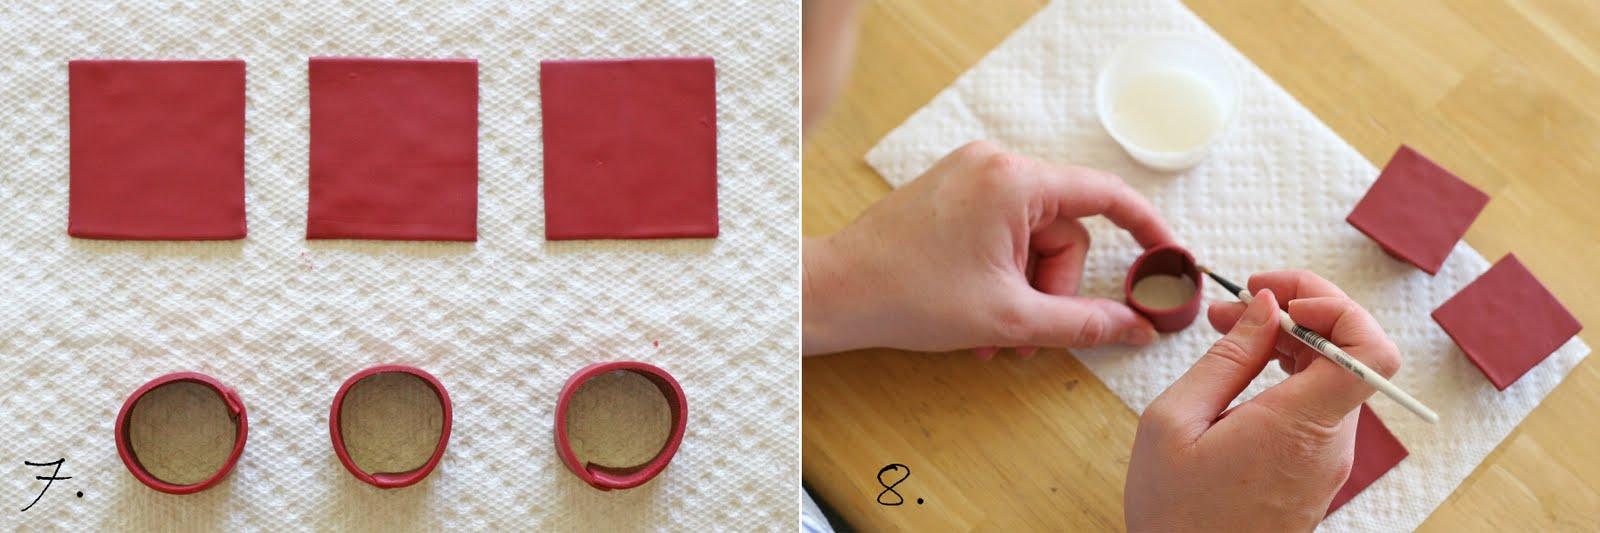 Pics photos how to draw a graduation hat - Graduation Cupcakes And How To Make Fondant Graduation Caps